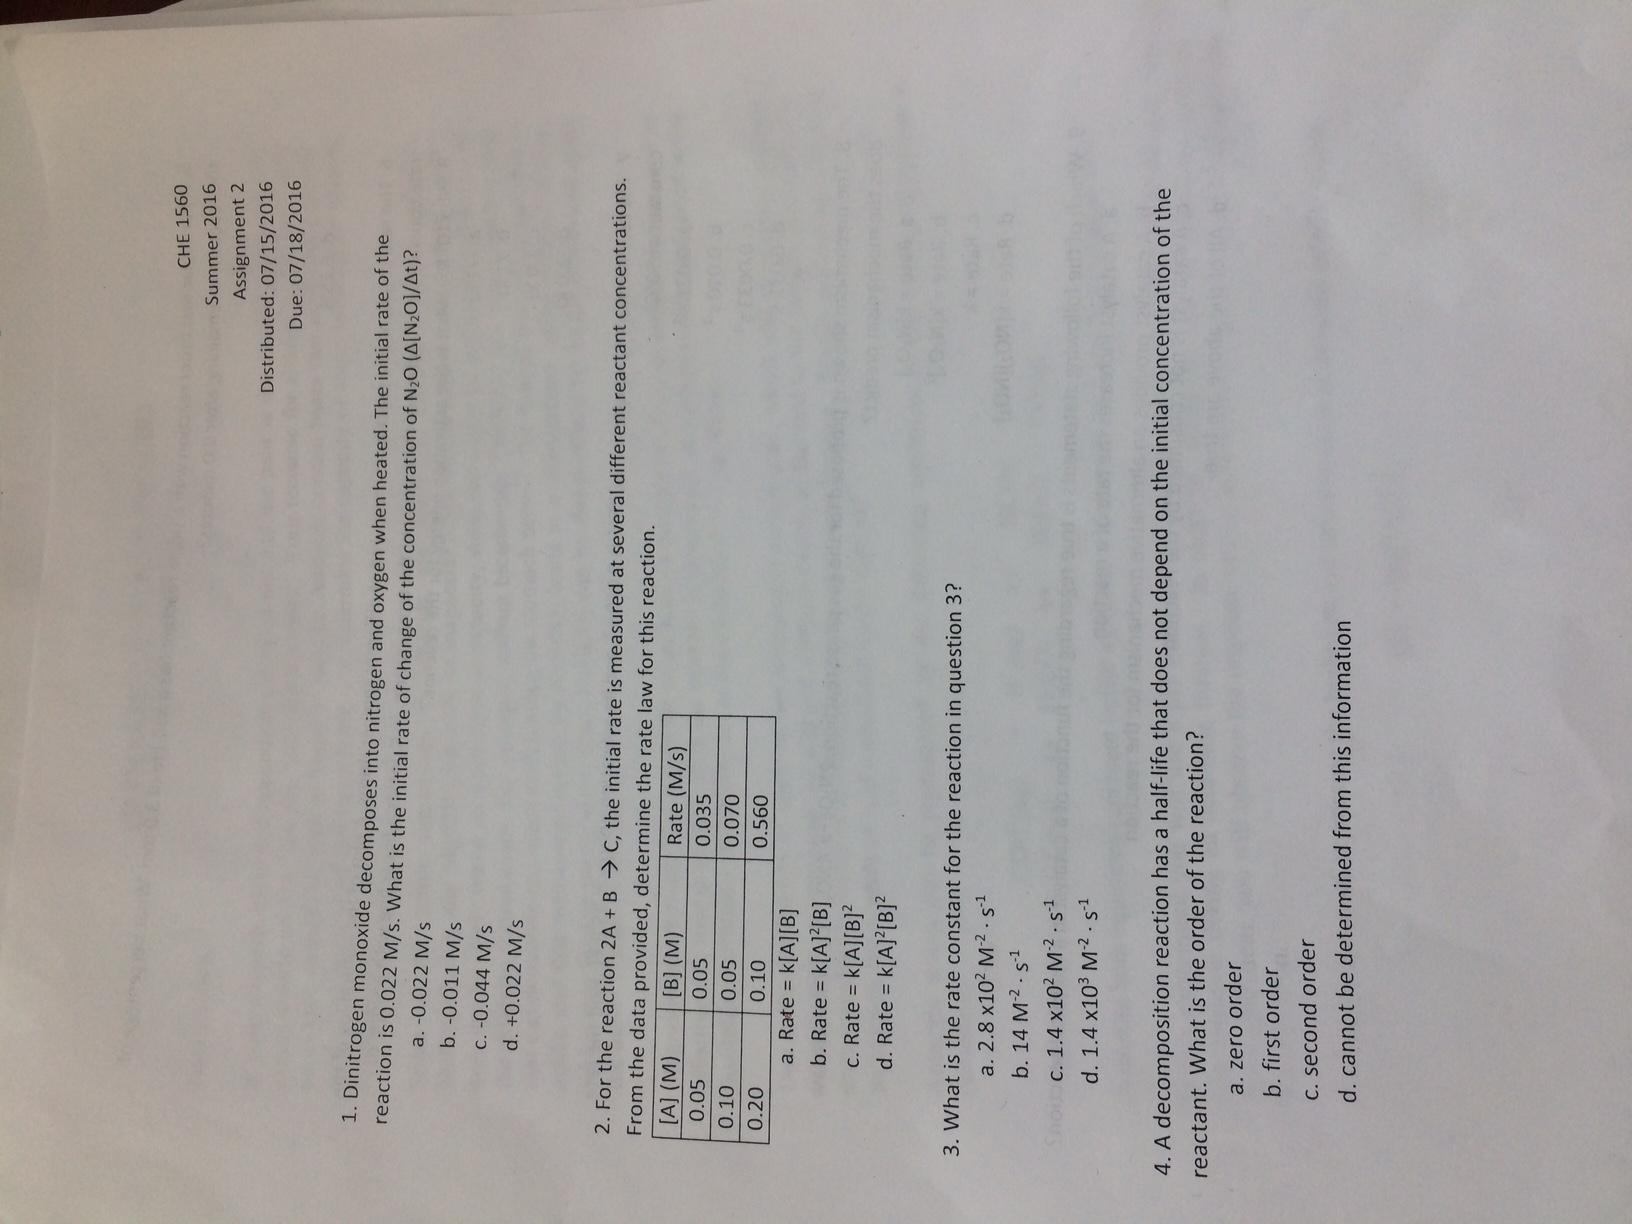 i need someone to do my chemistry homework